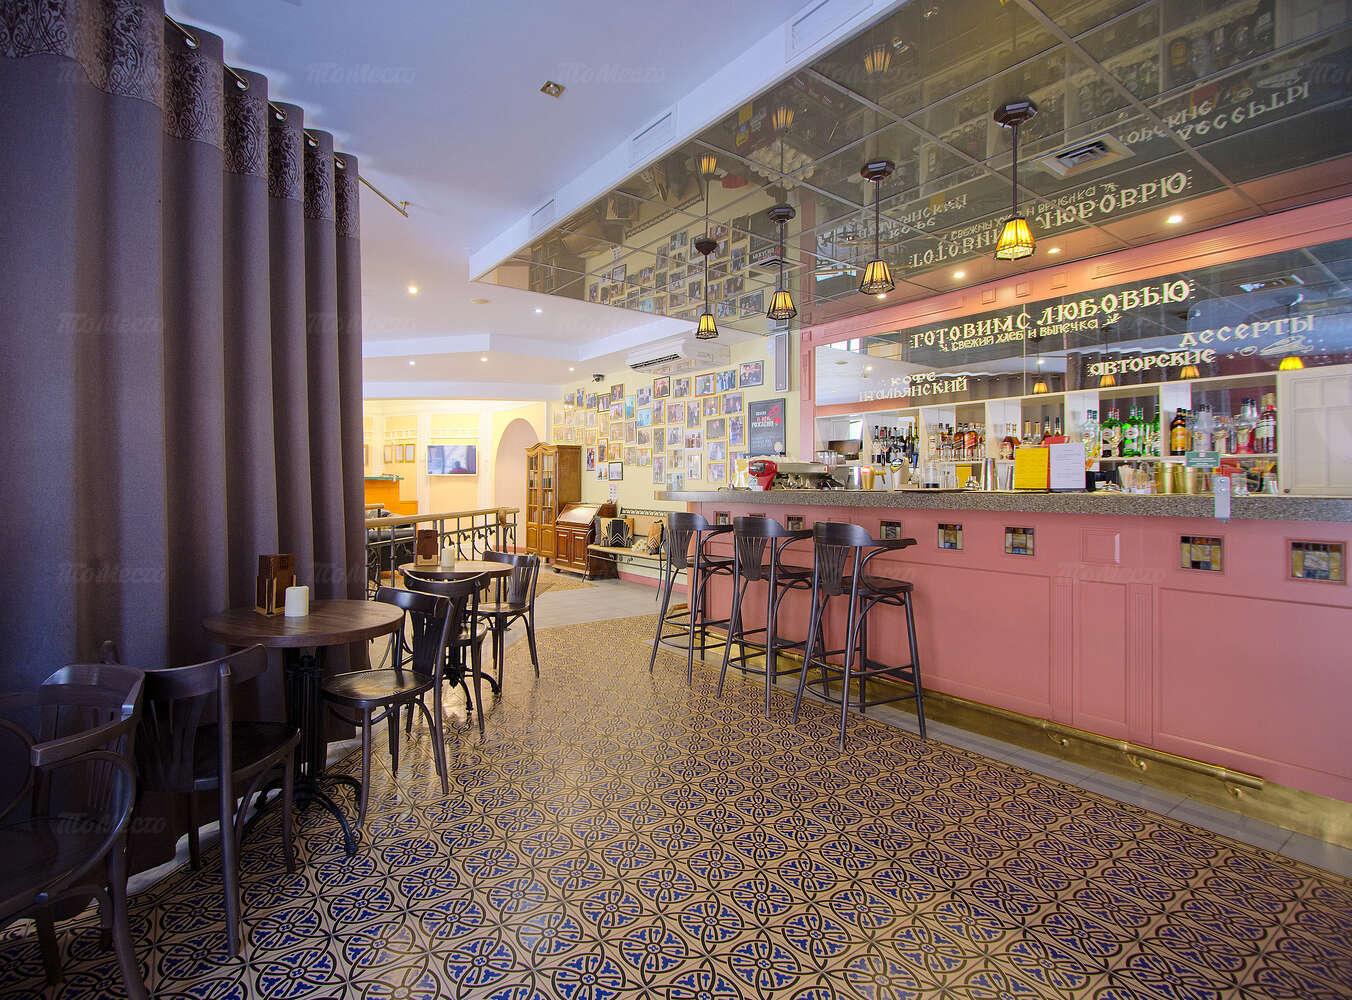 Ресторан Степнов на Суворовском проспекте фото 6